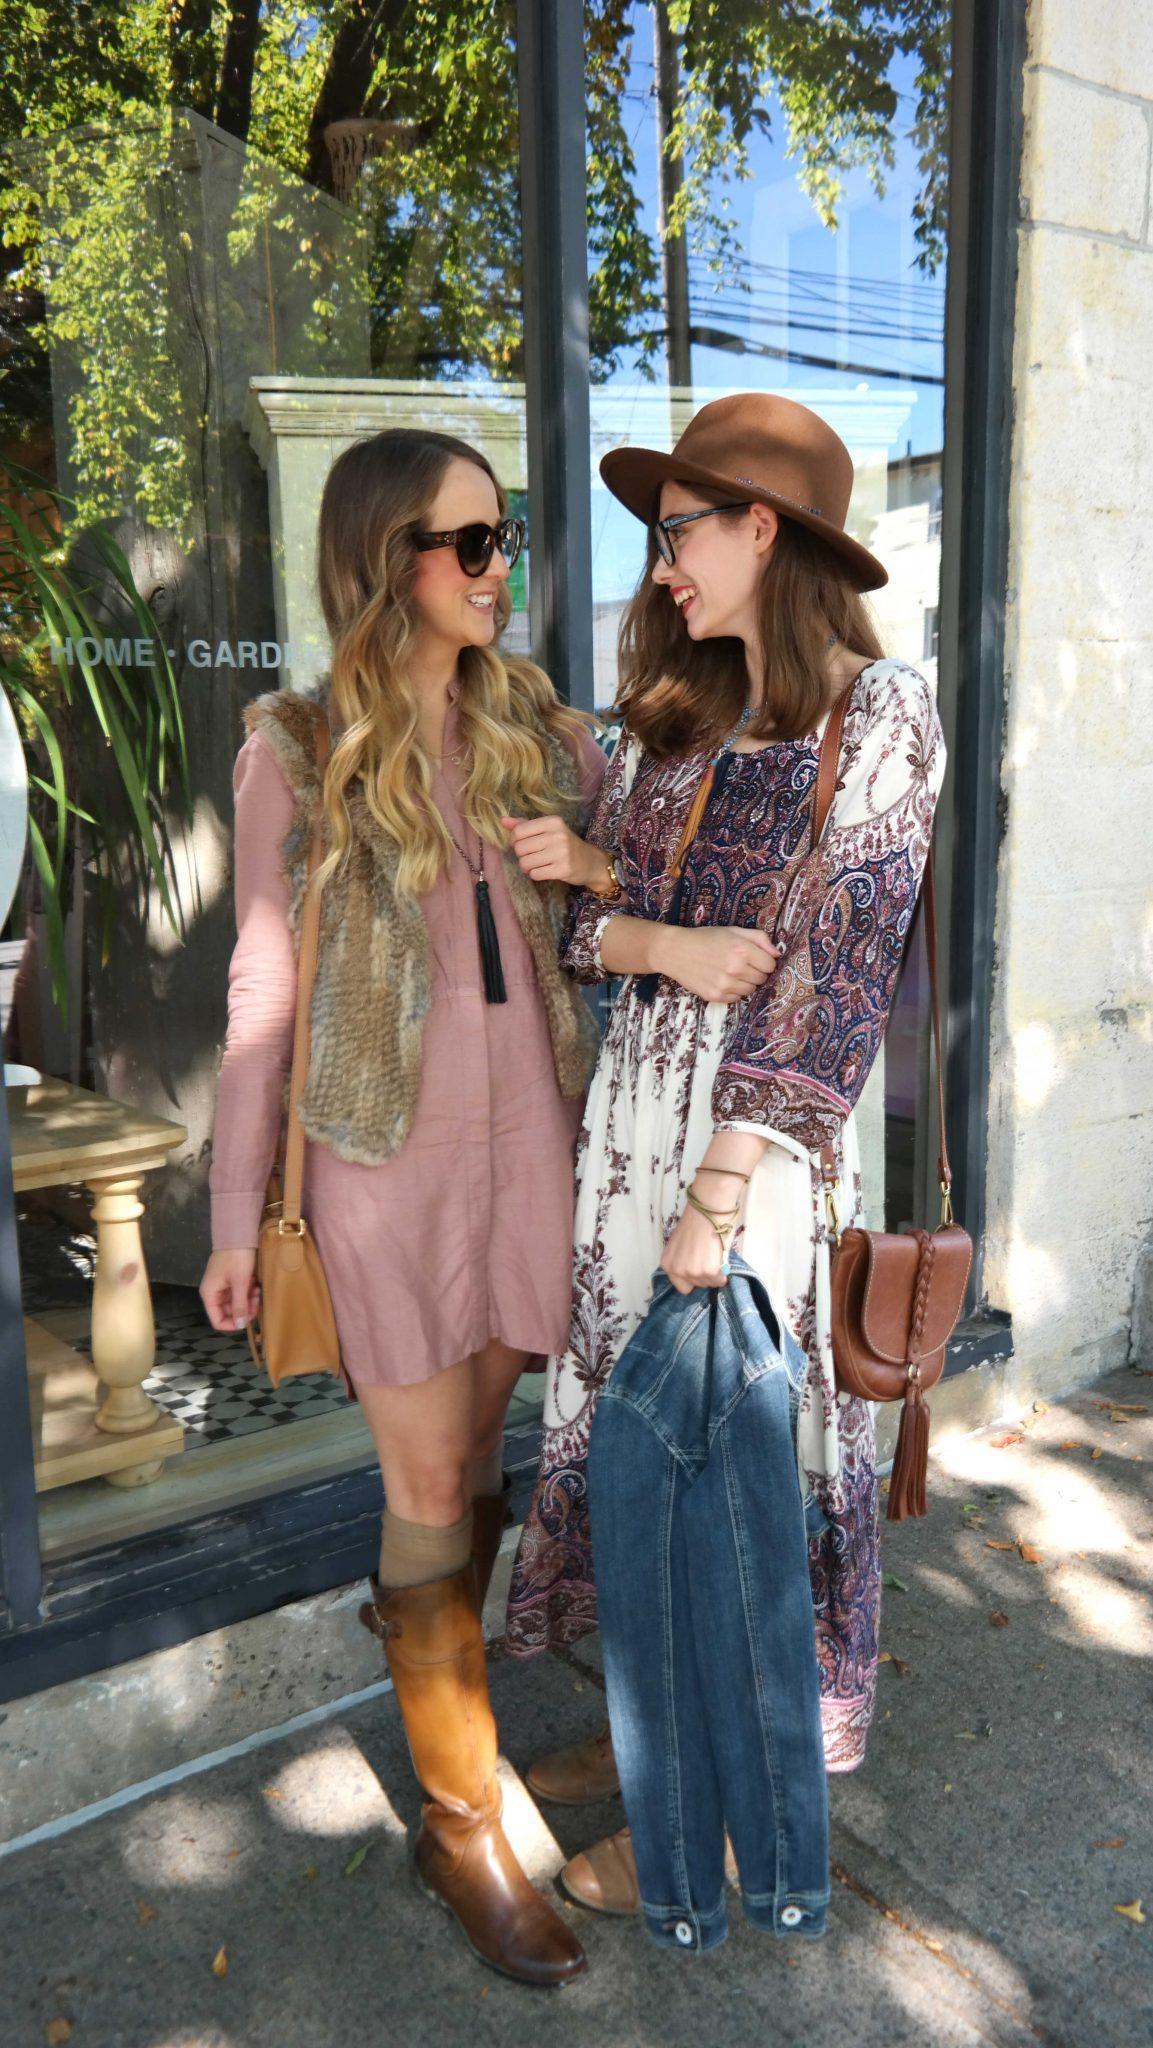 shopping-in-halifax-hydrostone-neighborhood